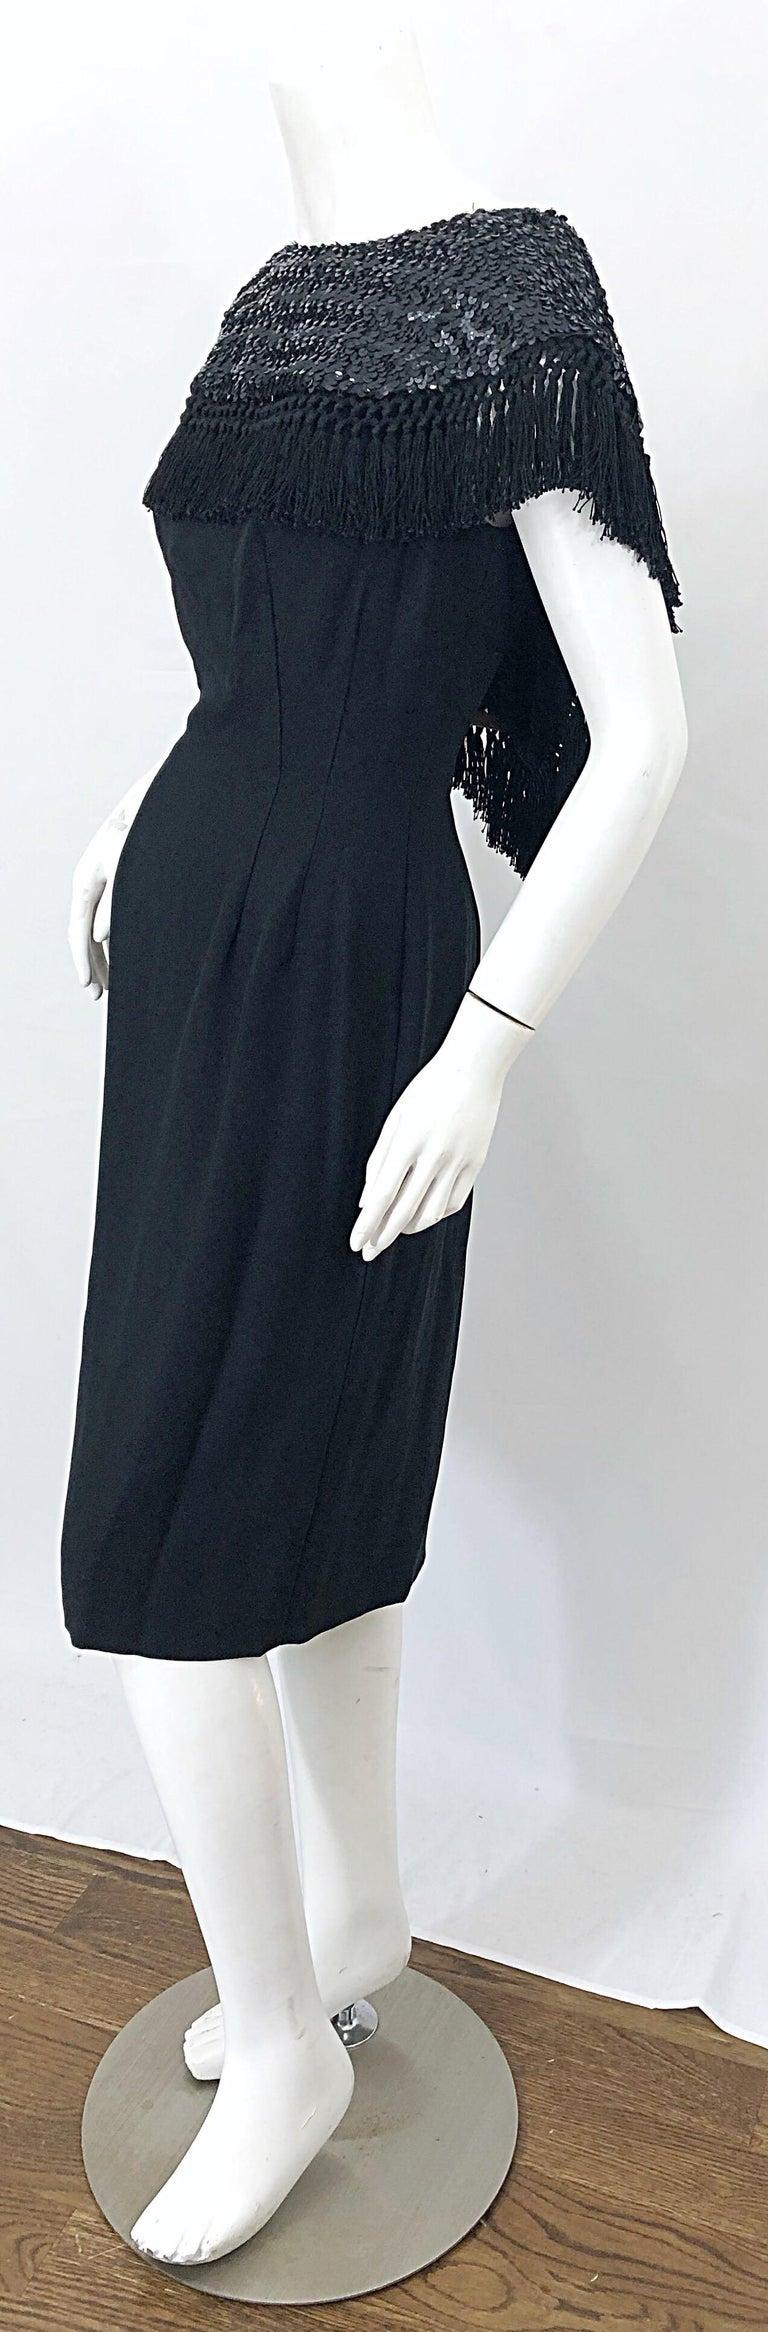 Women's 1950s Demi Couture Black Silk Crepe Dramatic Sequin Neck Fringe Vintage Dress For Sale